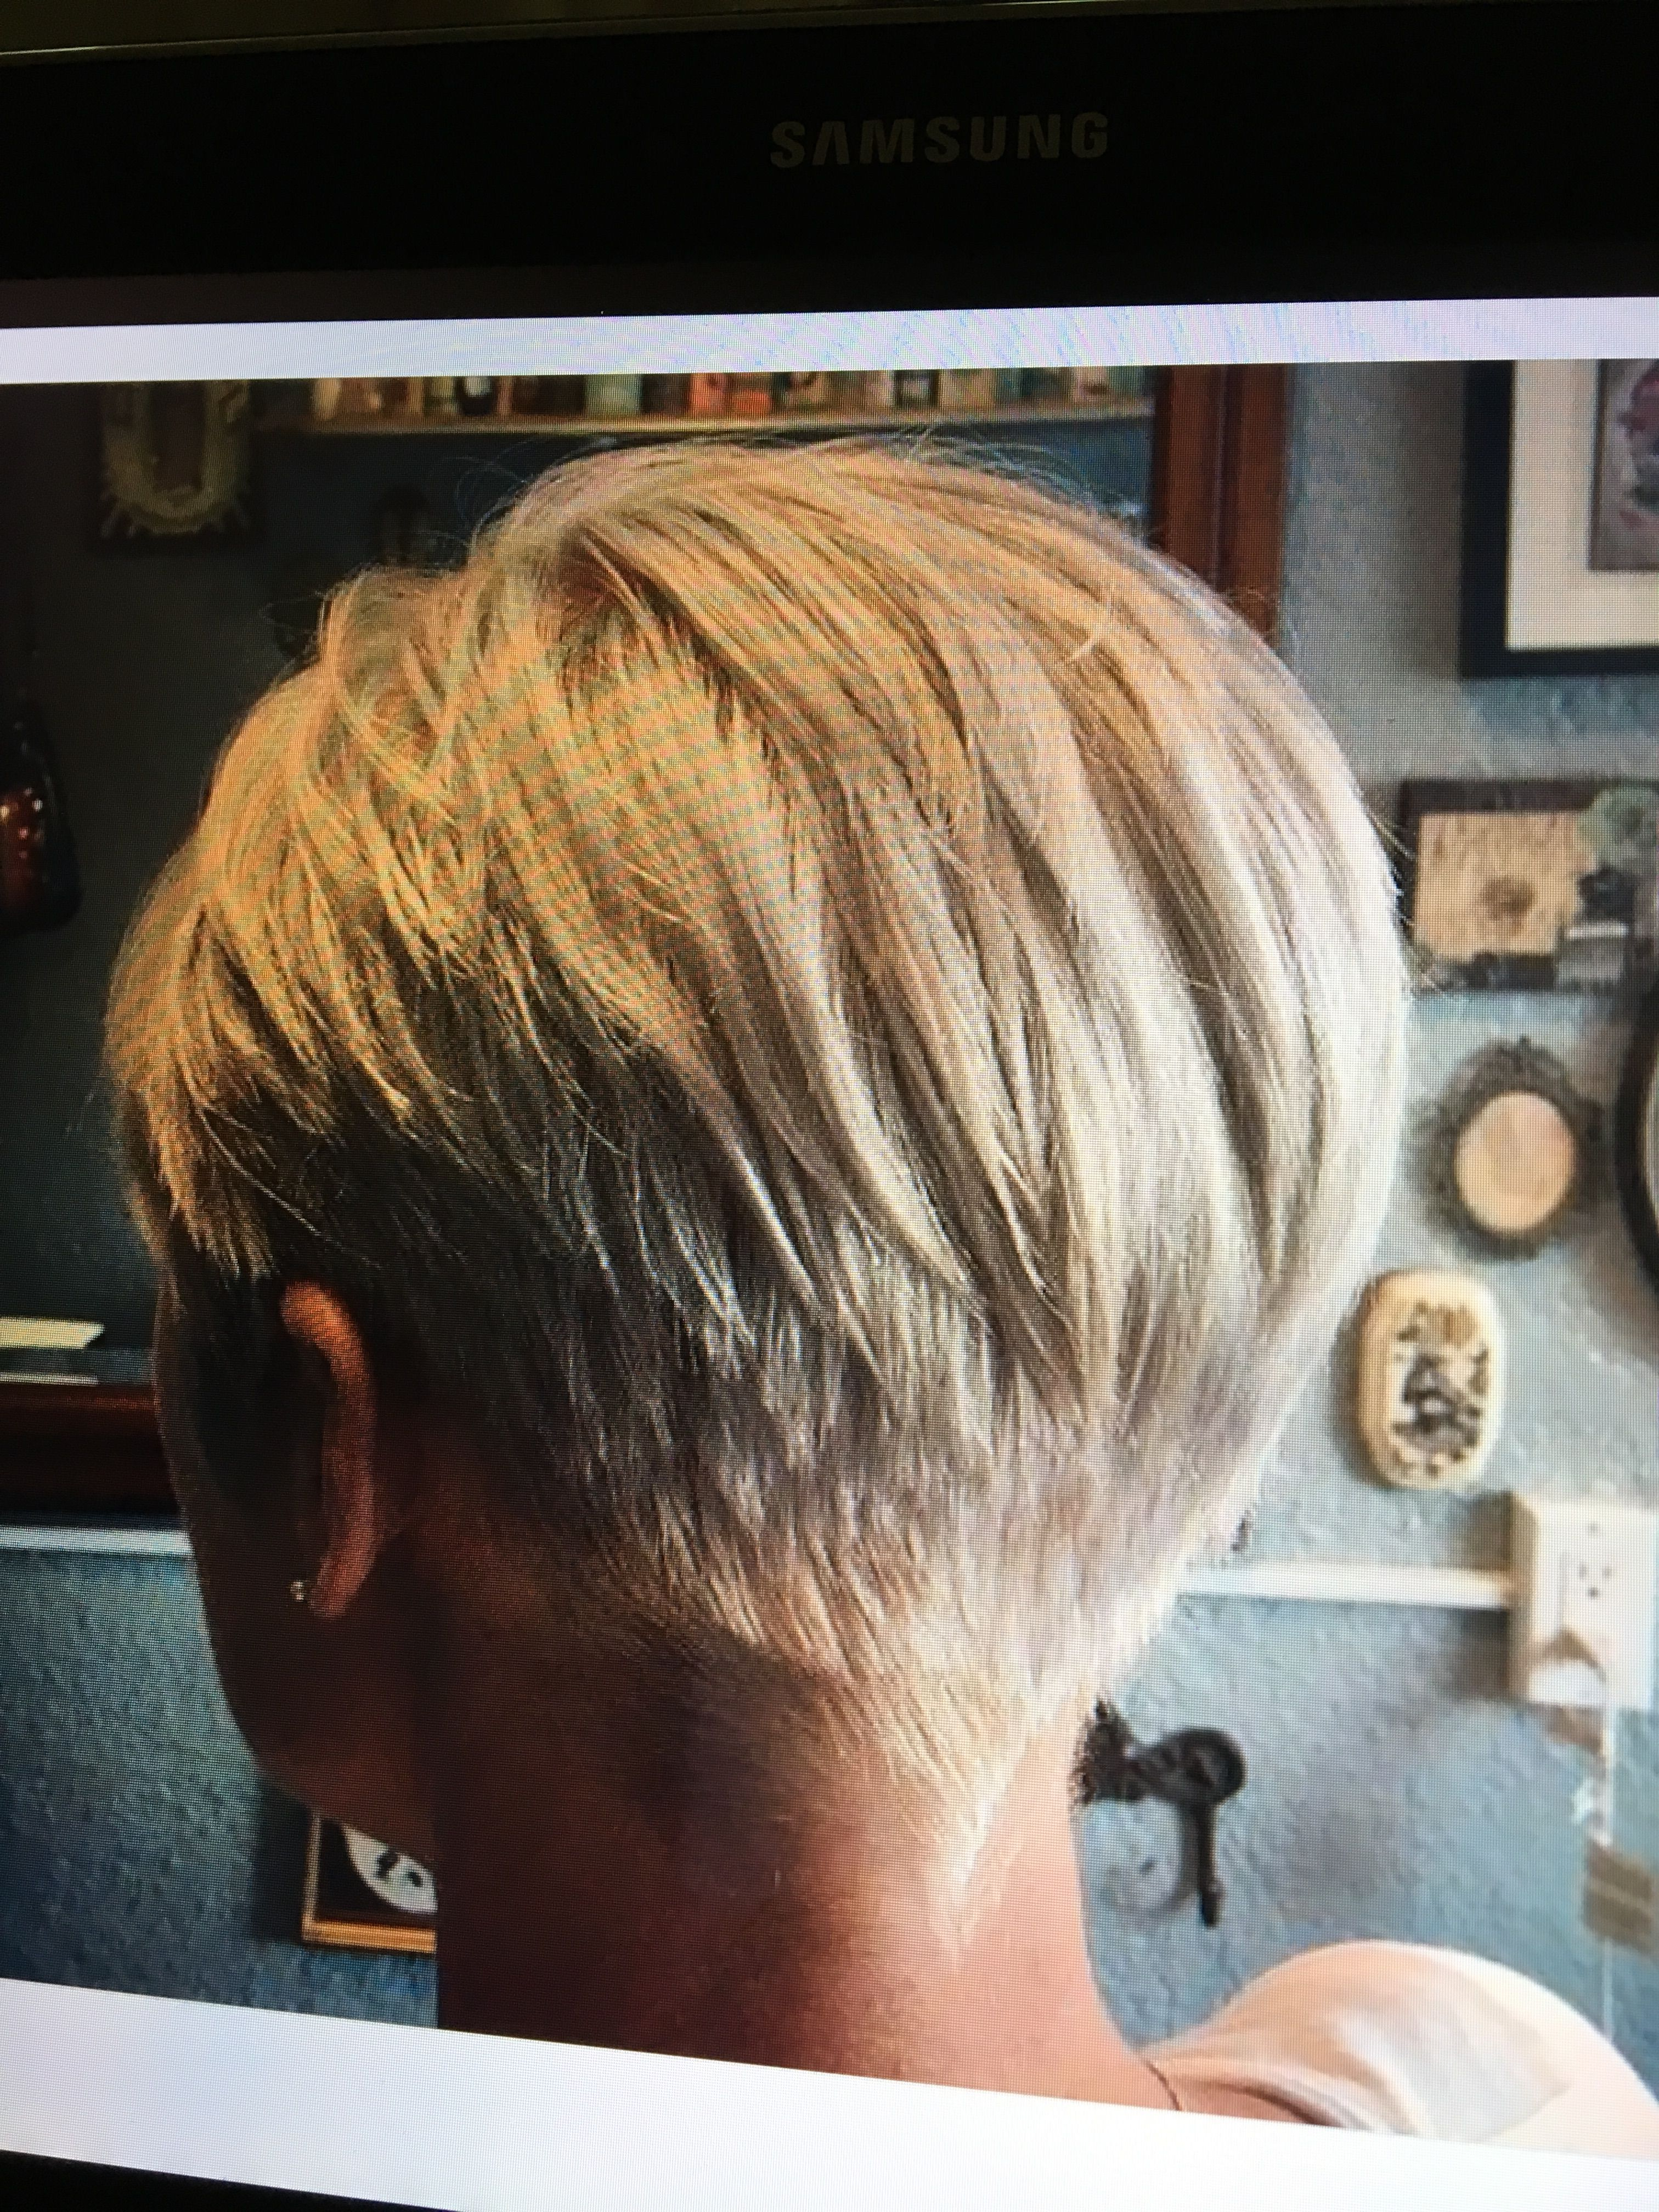 Neckline Haircut For Ladies : neckline, haircut, ladies, Short, Hairstyles